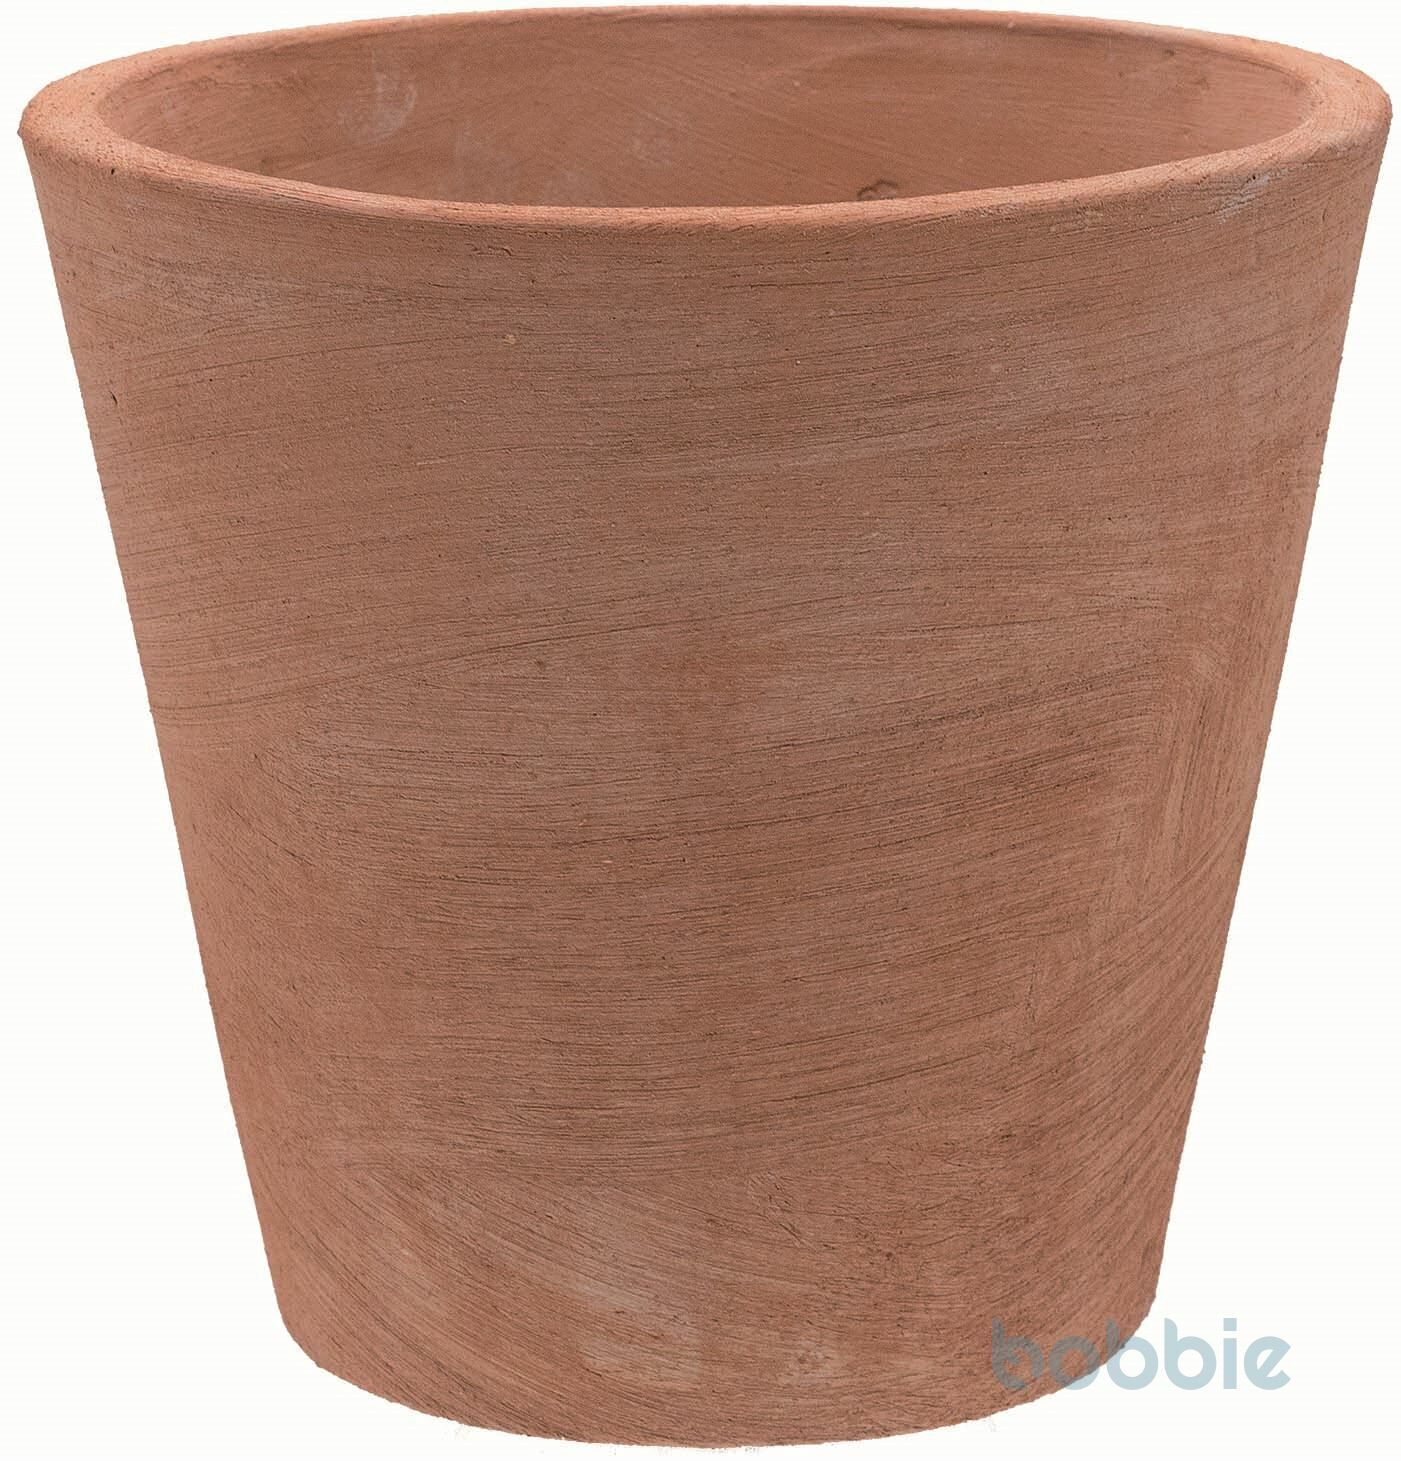 Blumentopf moderner Kegel - CONICO MODERNE